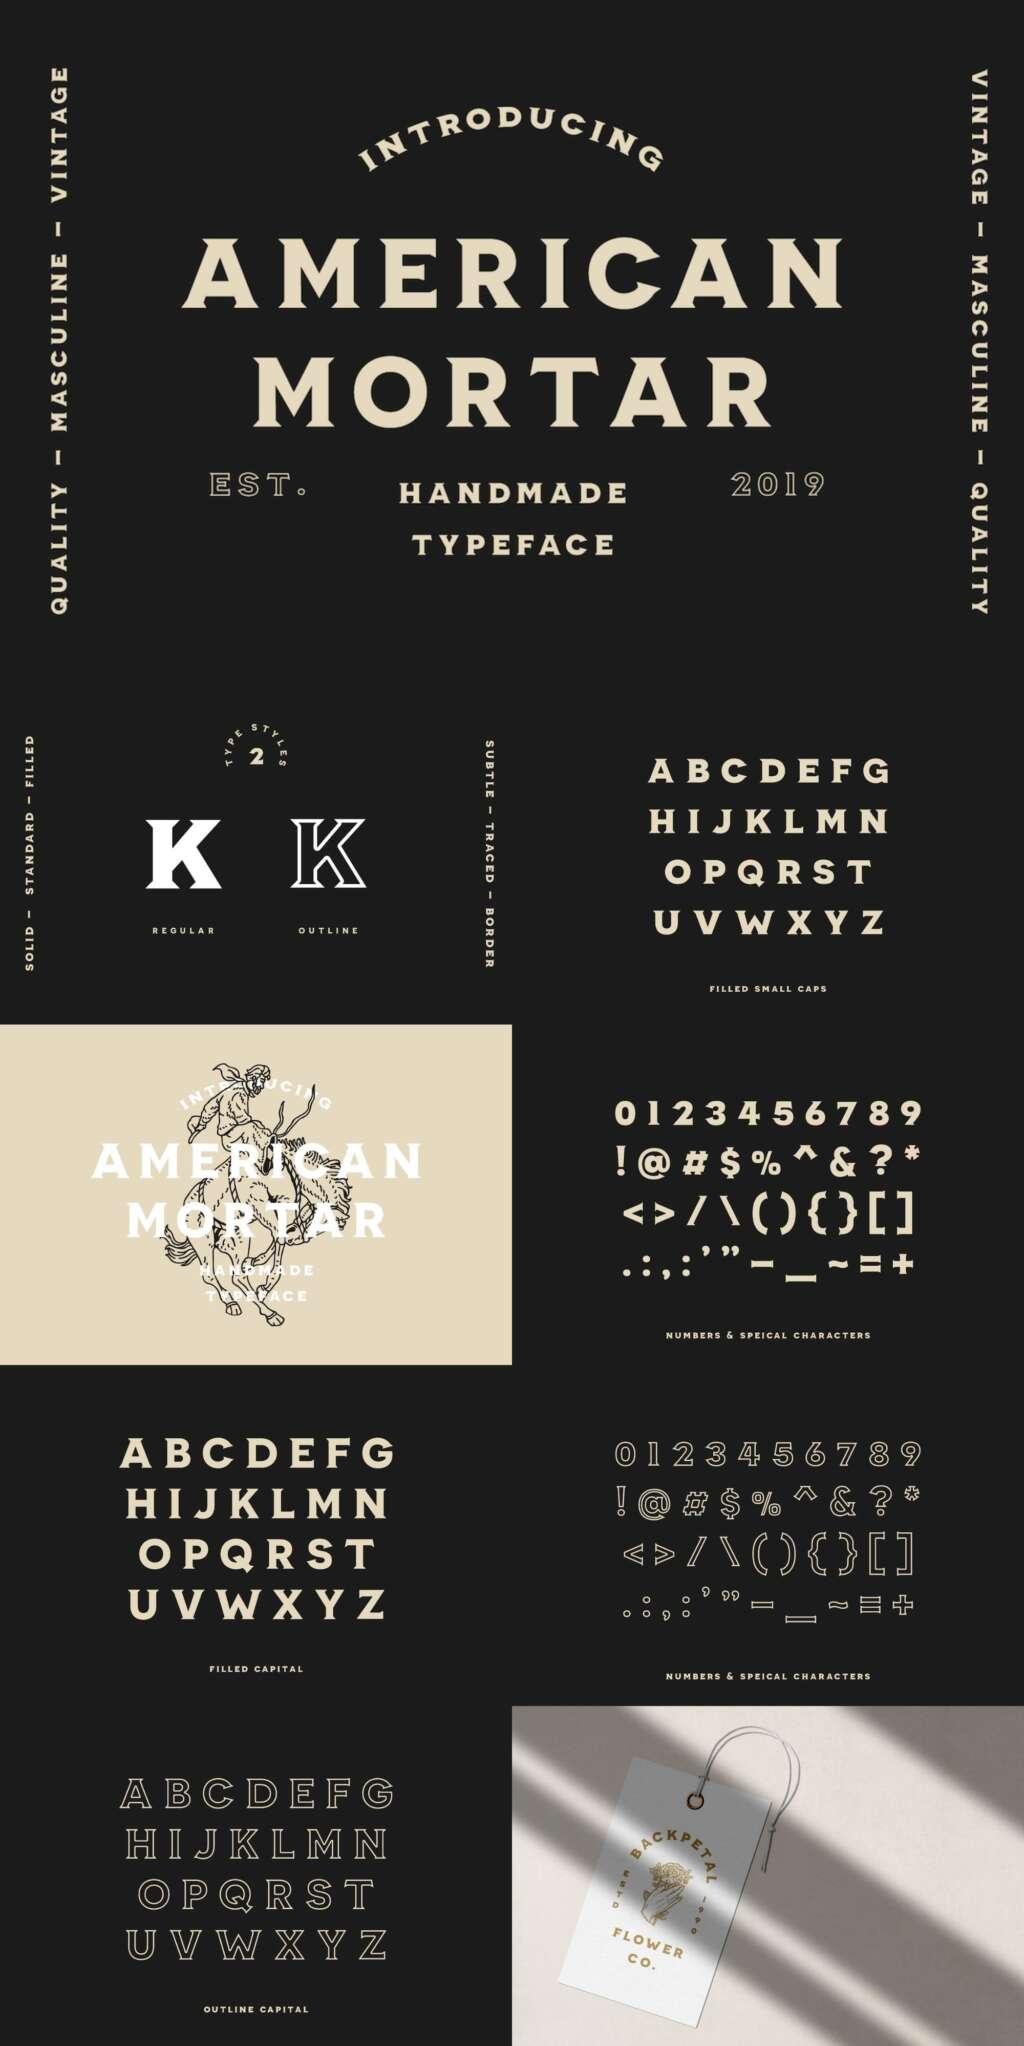 American Mortar – Vintage Font Family